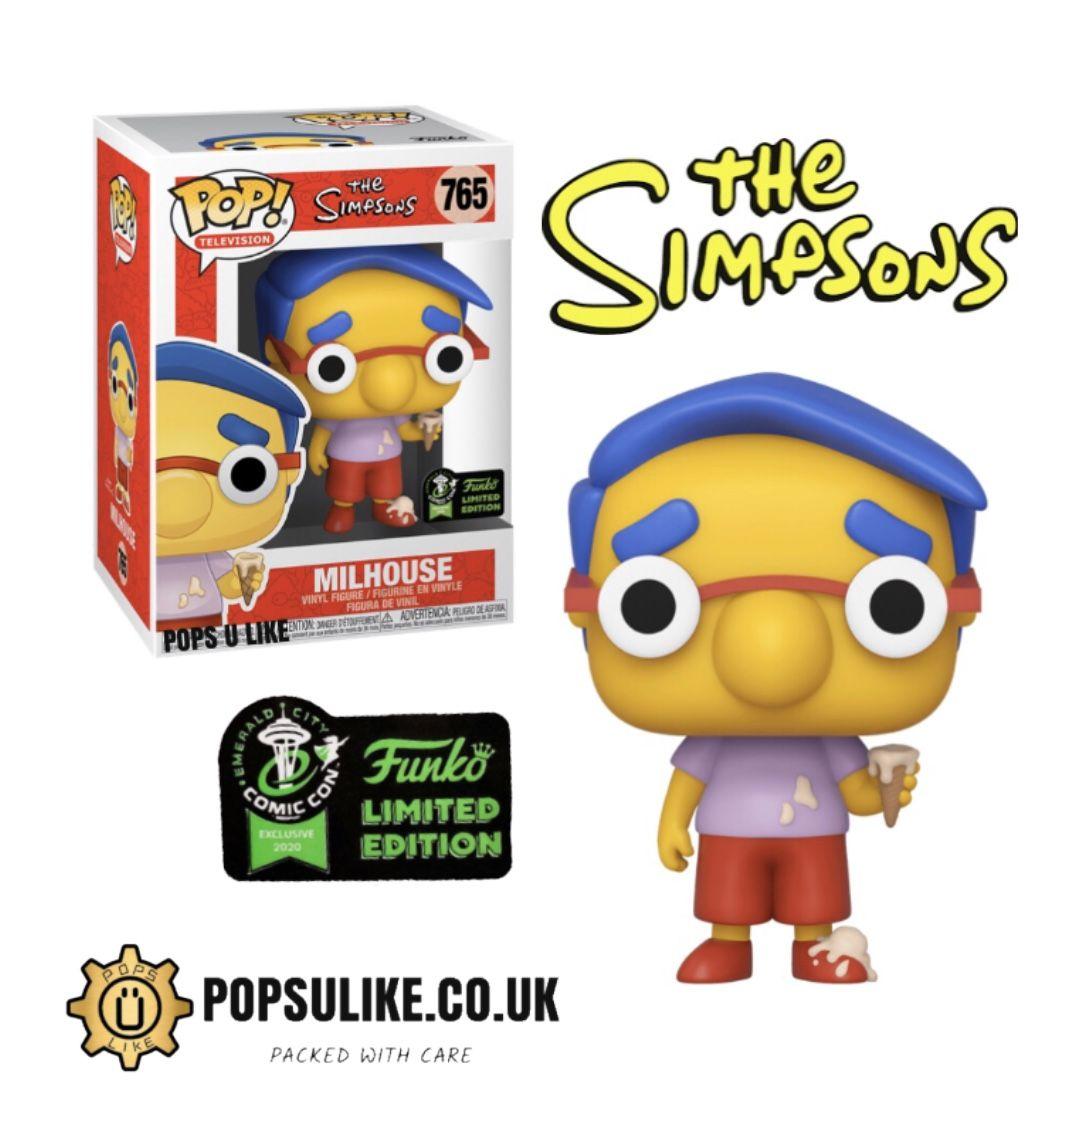 Los Simpsons ECCC 2020 EXCLUSIVO Milhouse 45922 FUNKO POP